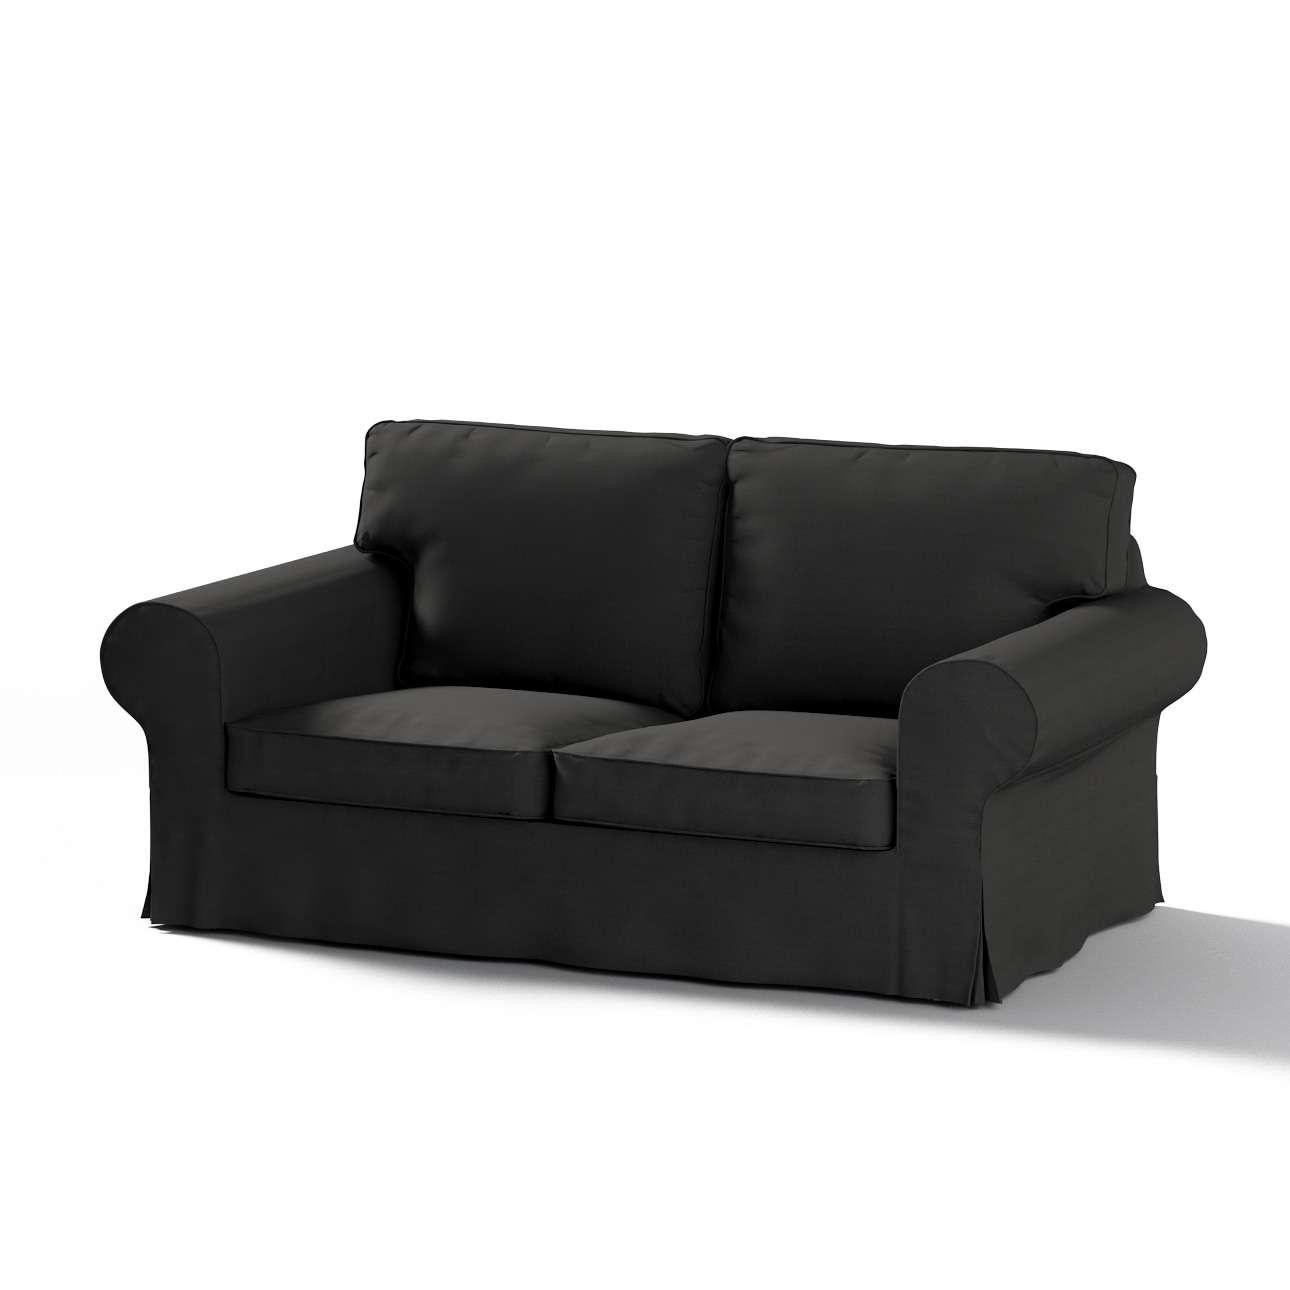 Ektorp 2 sæder sovesofa gammel model<br/>Bredde ca 195cm Betræk uden sofa fra kollektionen Cotton Panama, Stof: 702-08